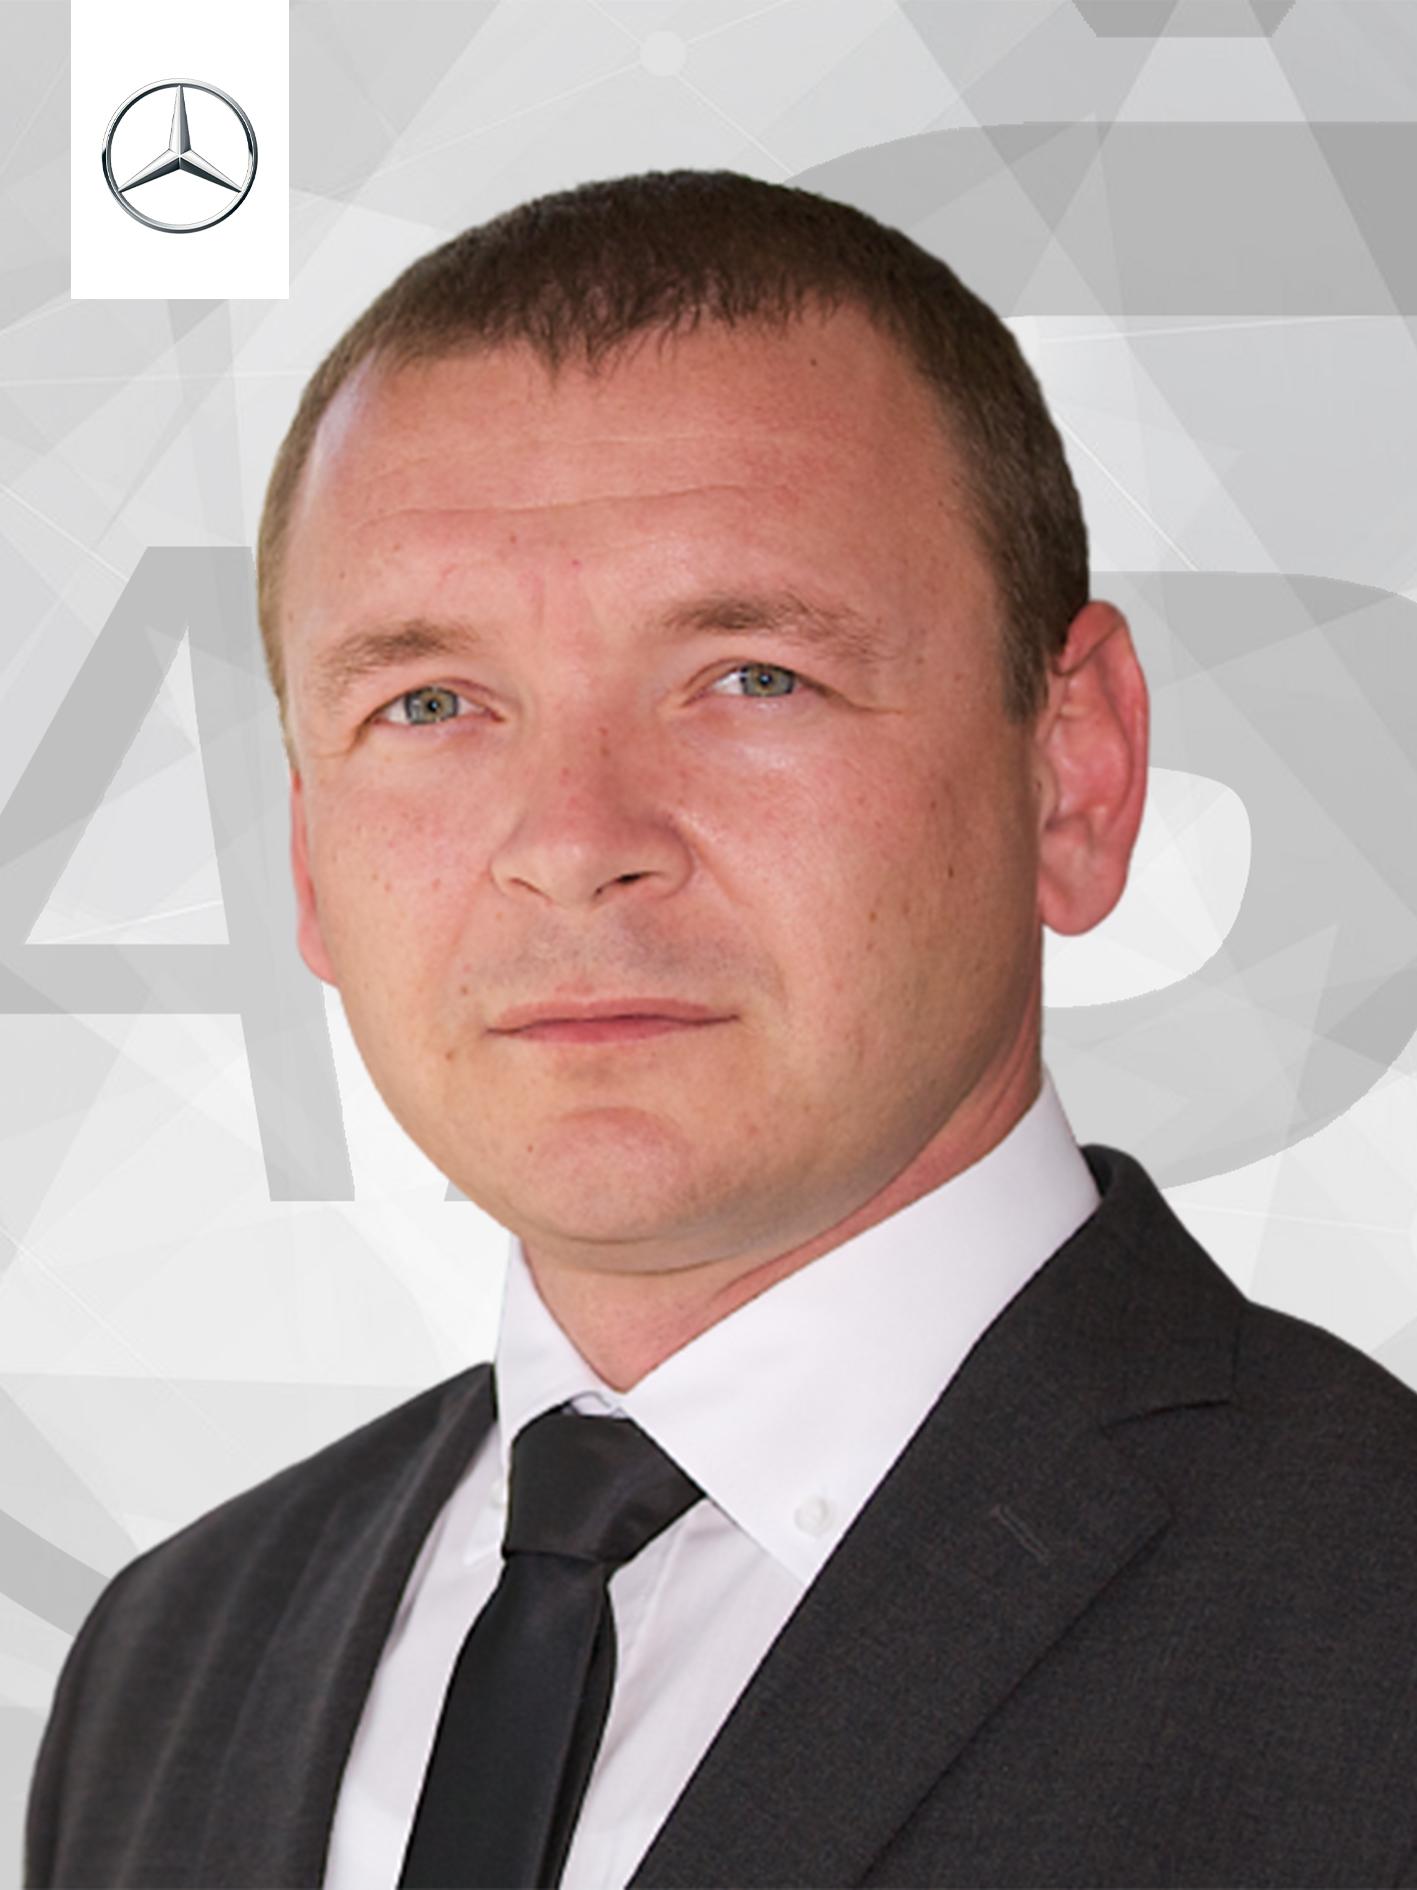 Kristijan Marjanović